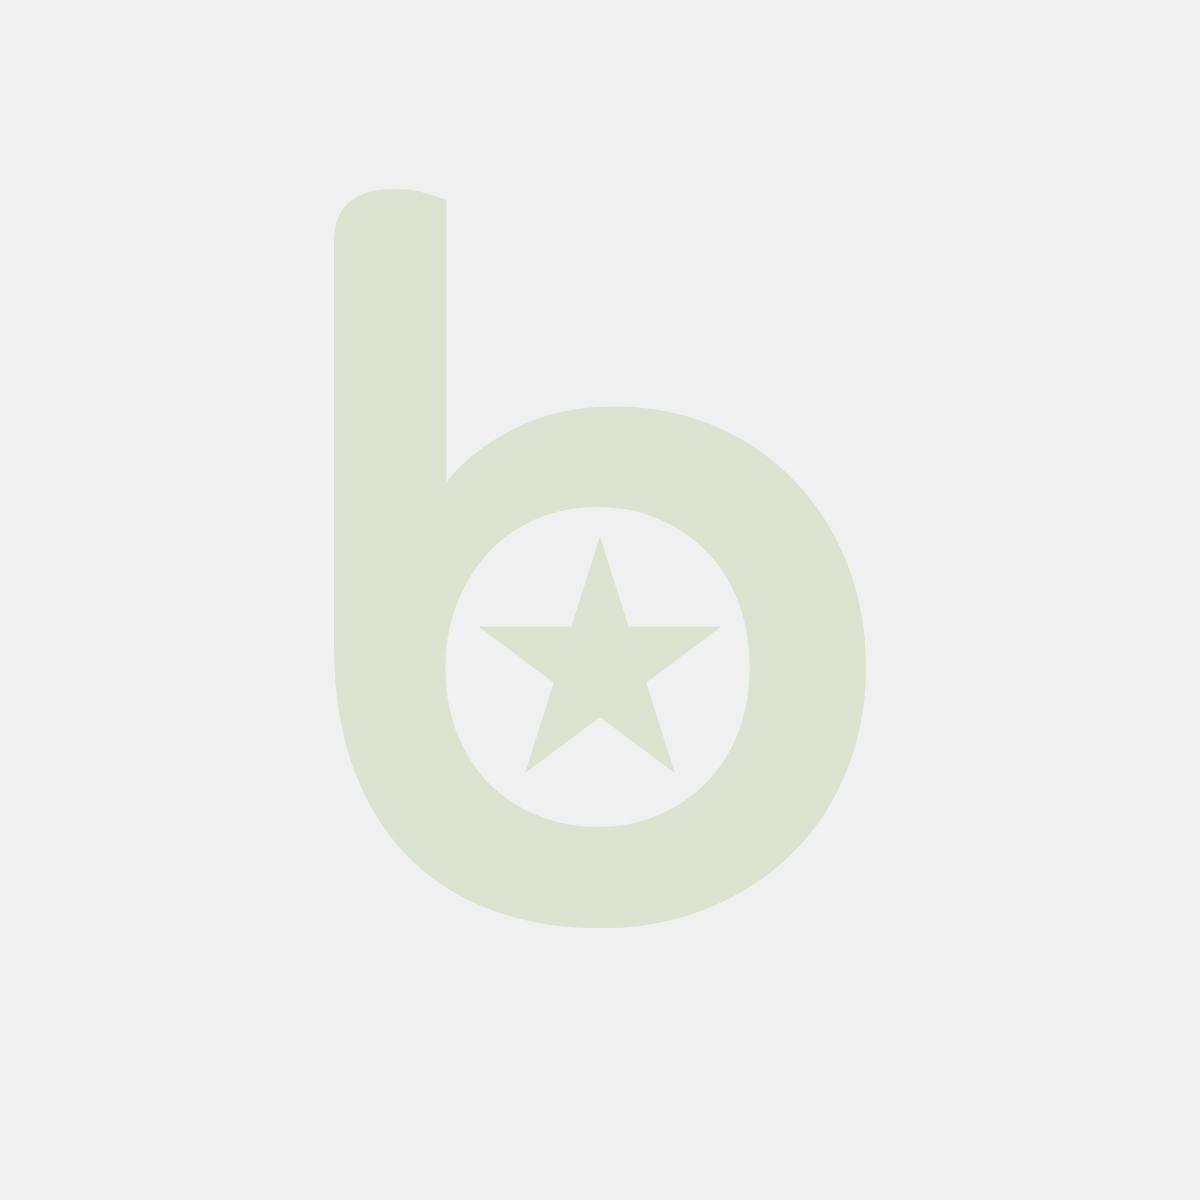 Świece stożkowe 25 cm terakota średnica 2,2 cm op. 50 sztuk